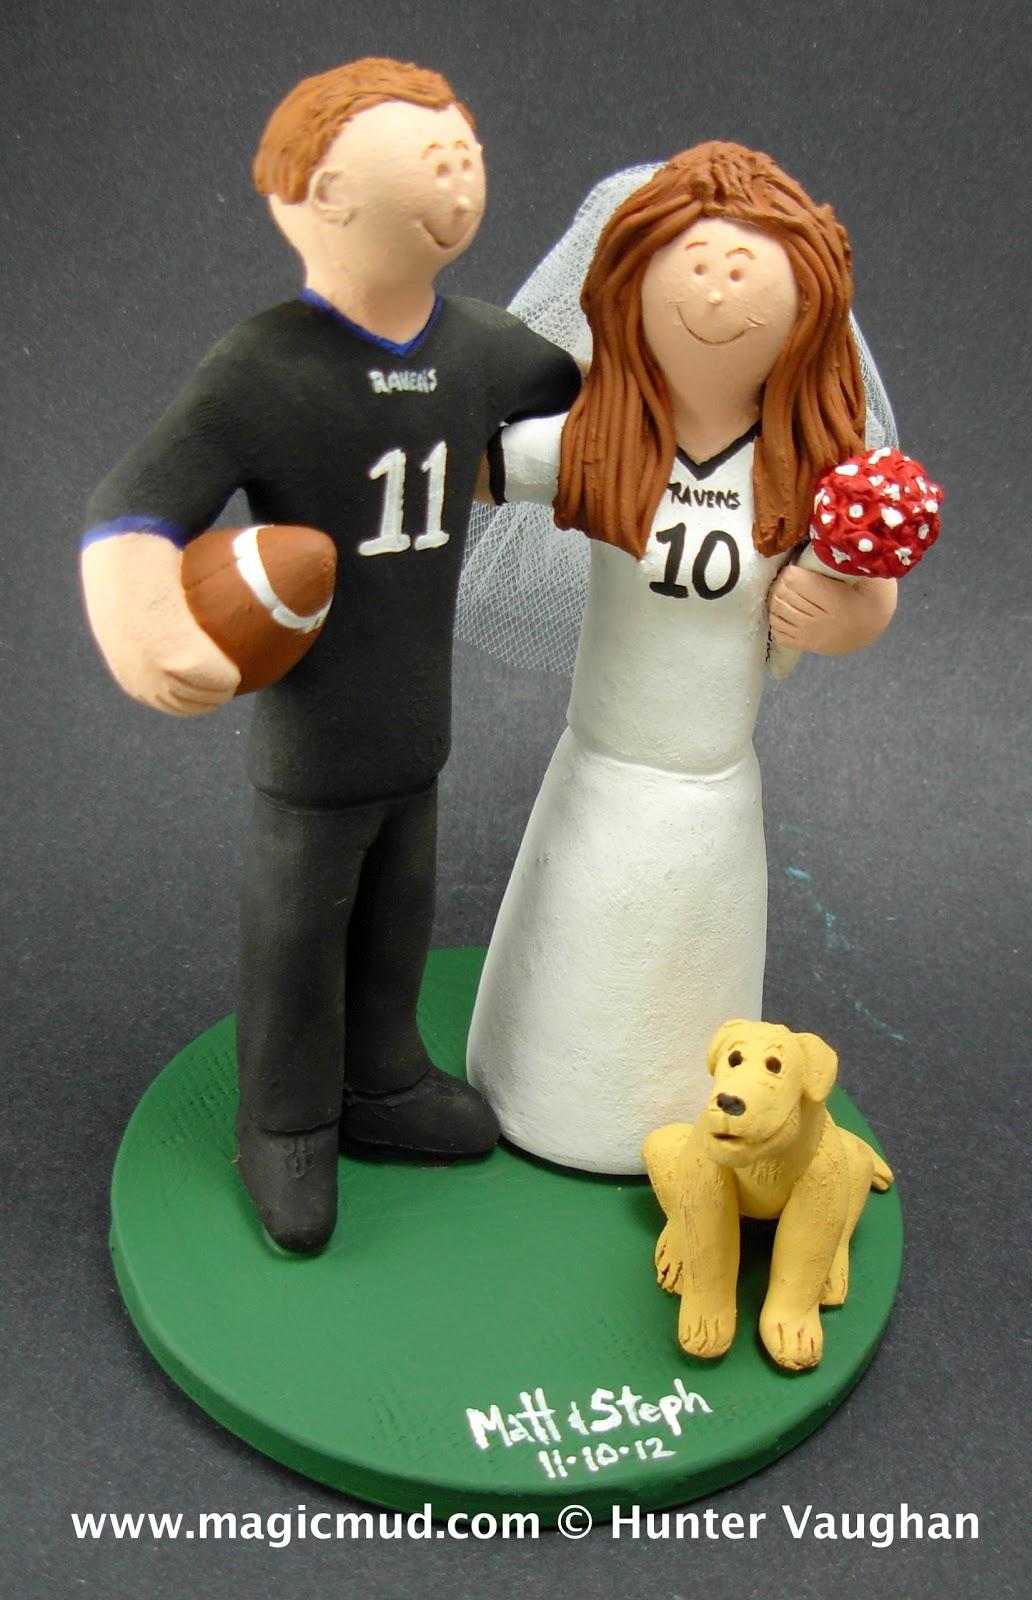 custom wedding cake toppers baltimore ravens fan 39 s wedding cake topper. Black Bedroom Furniture Sets. Home Design Ideas